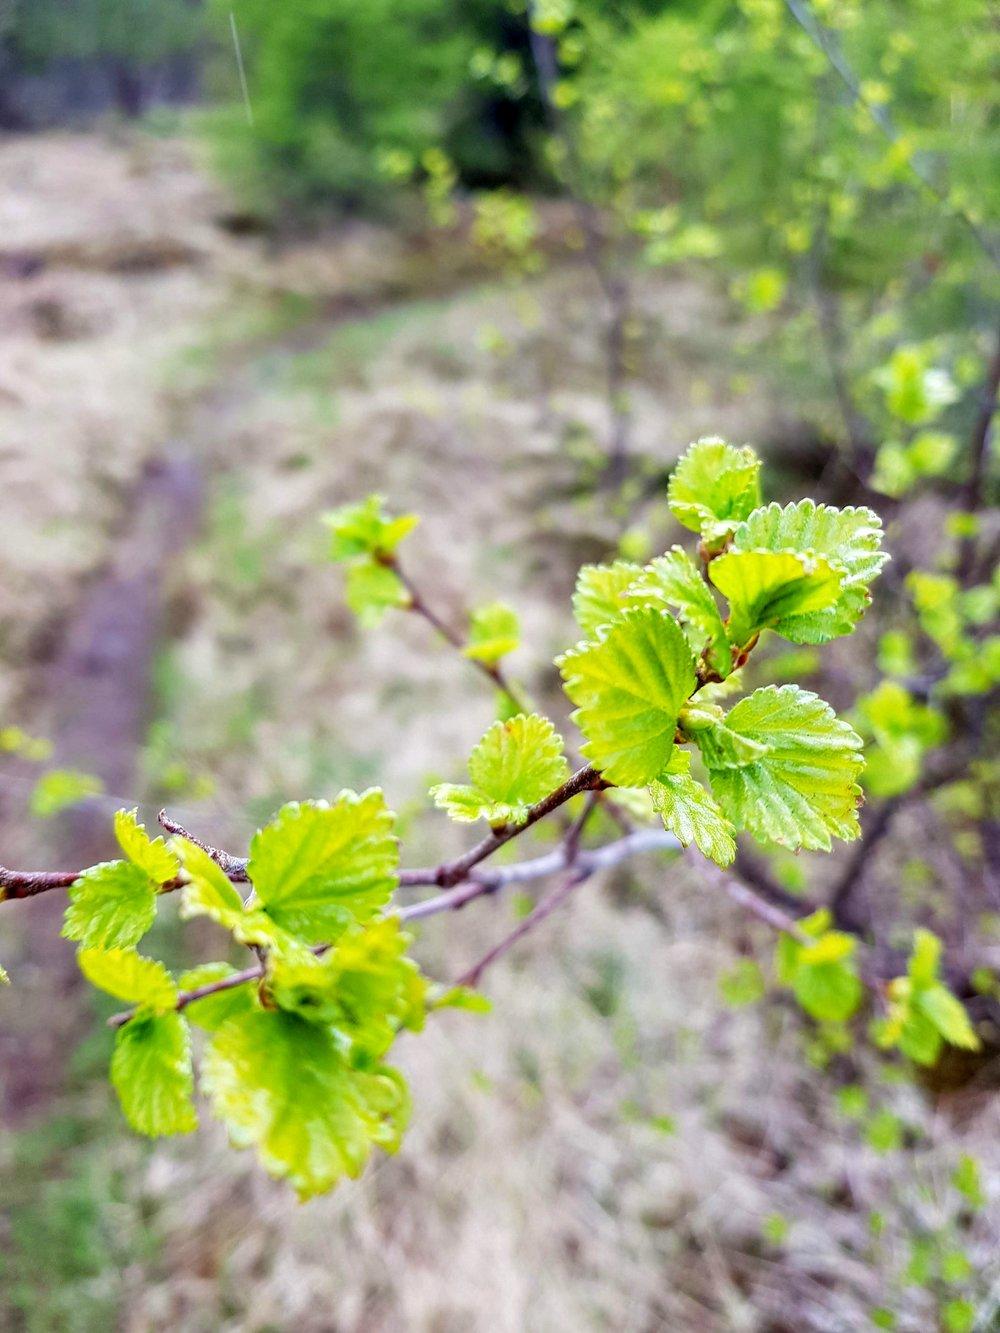 The birch starting to bud